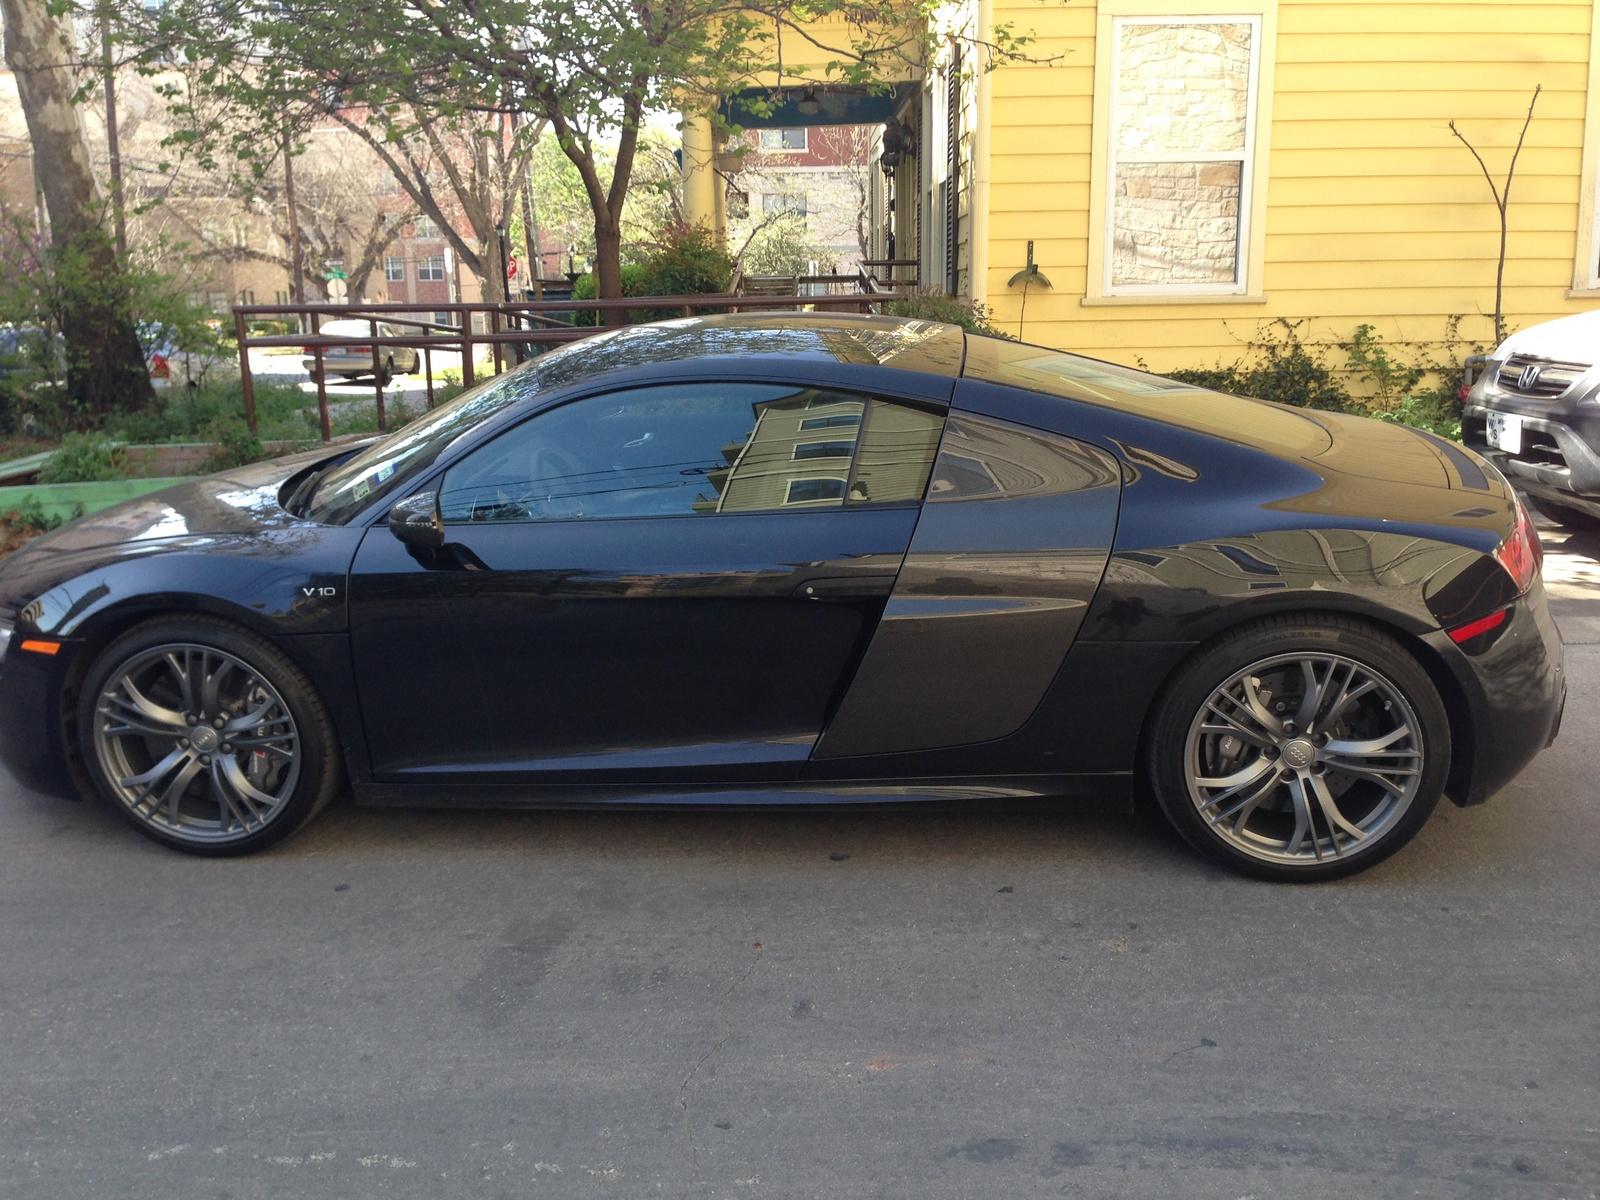 Picture of 2014 Audi R8 V10 Plus